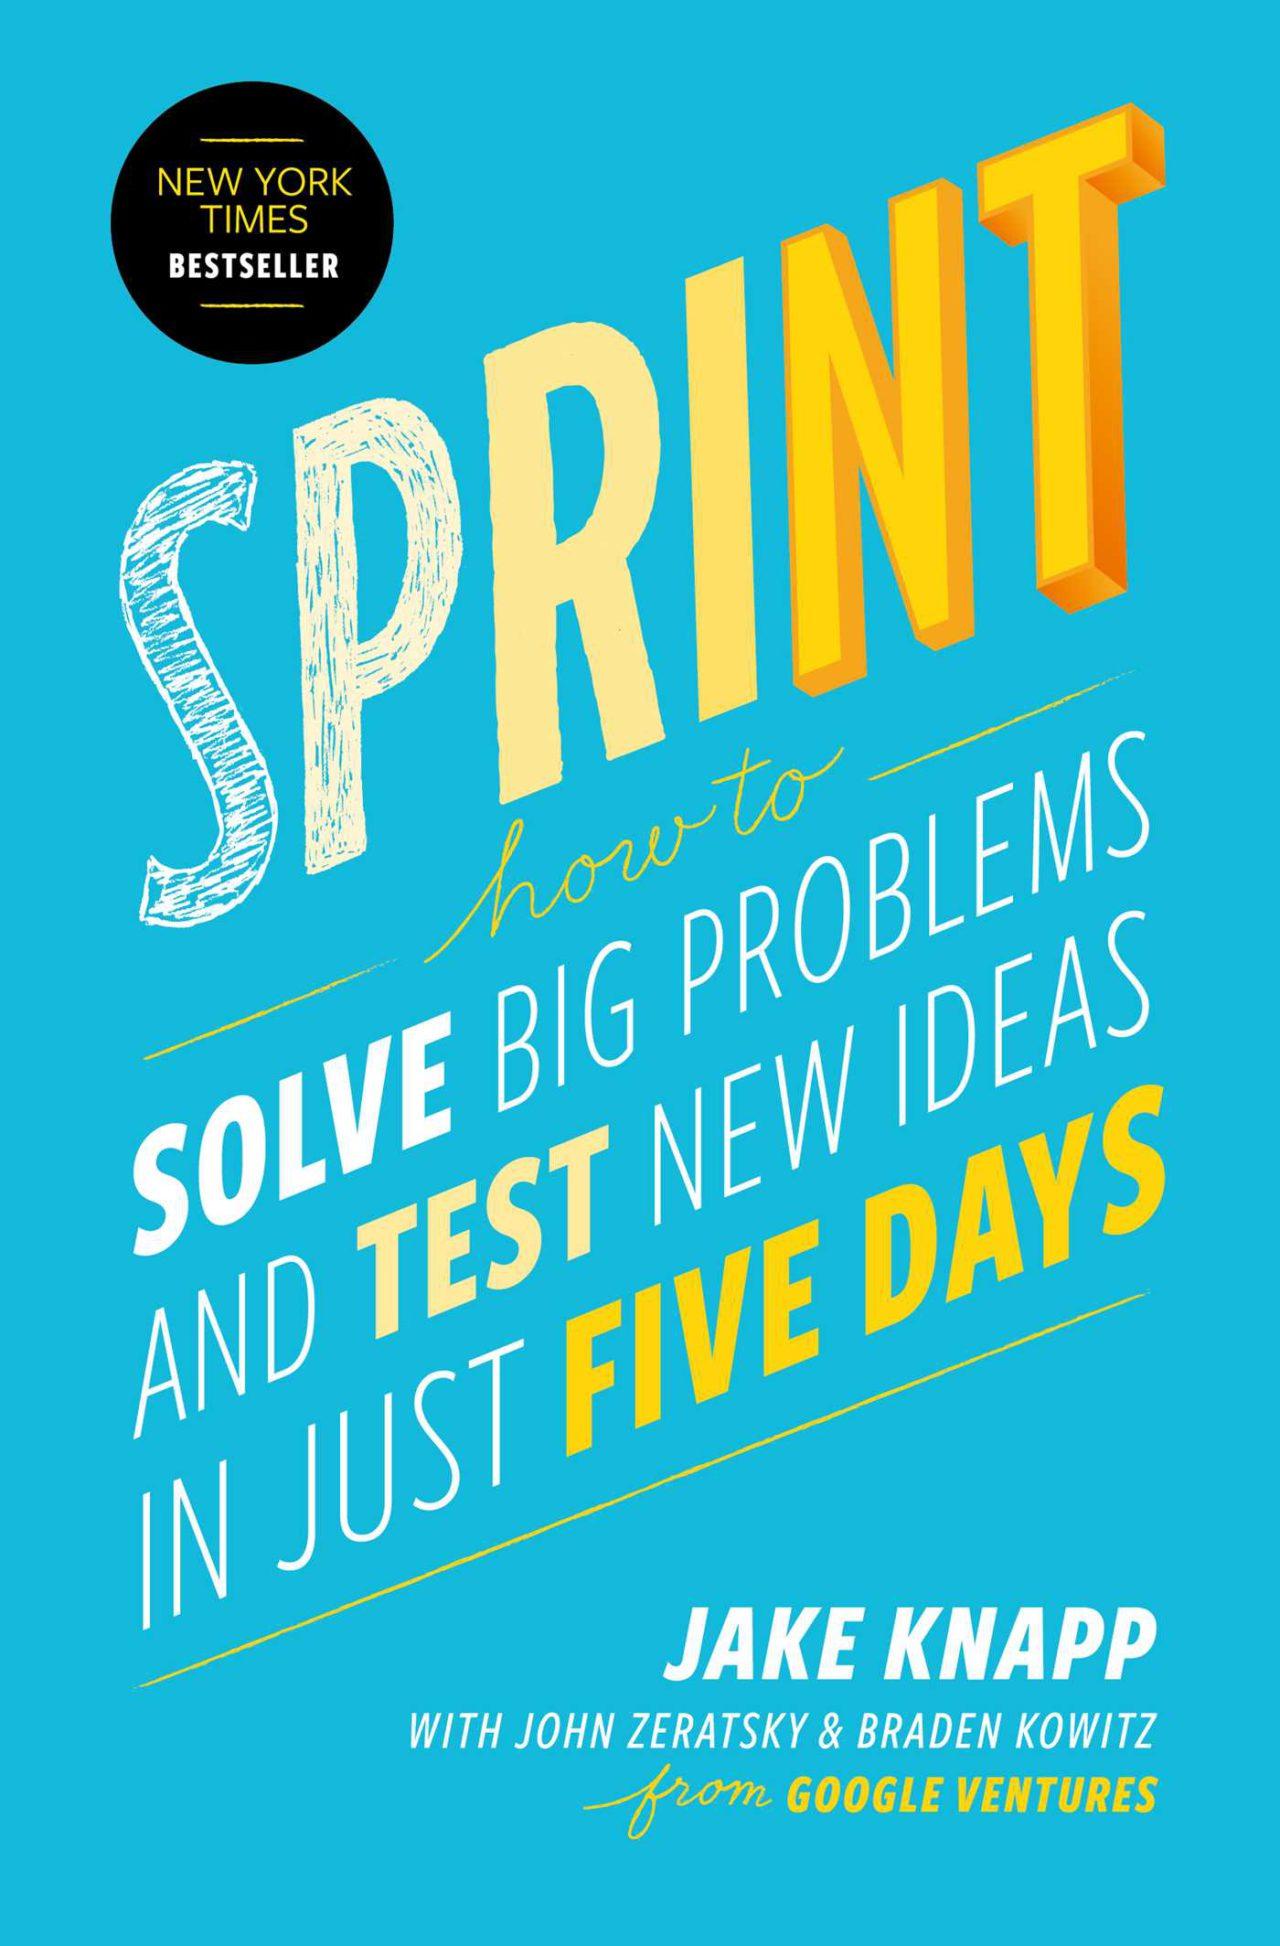 sprint-book-audible